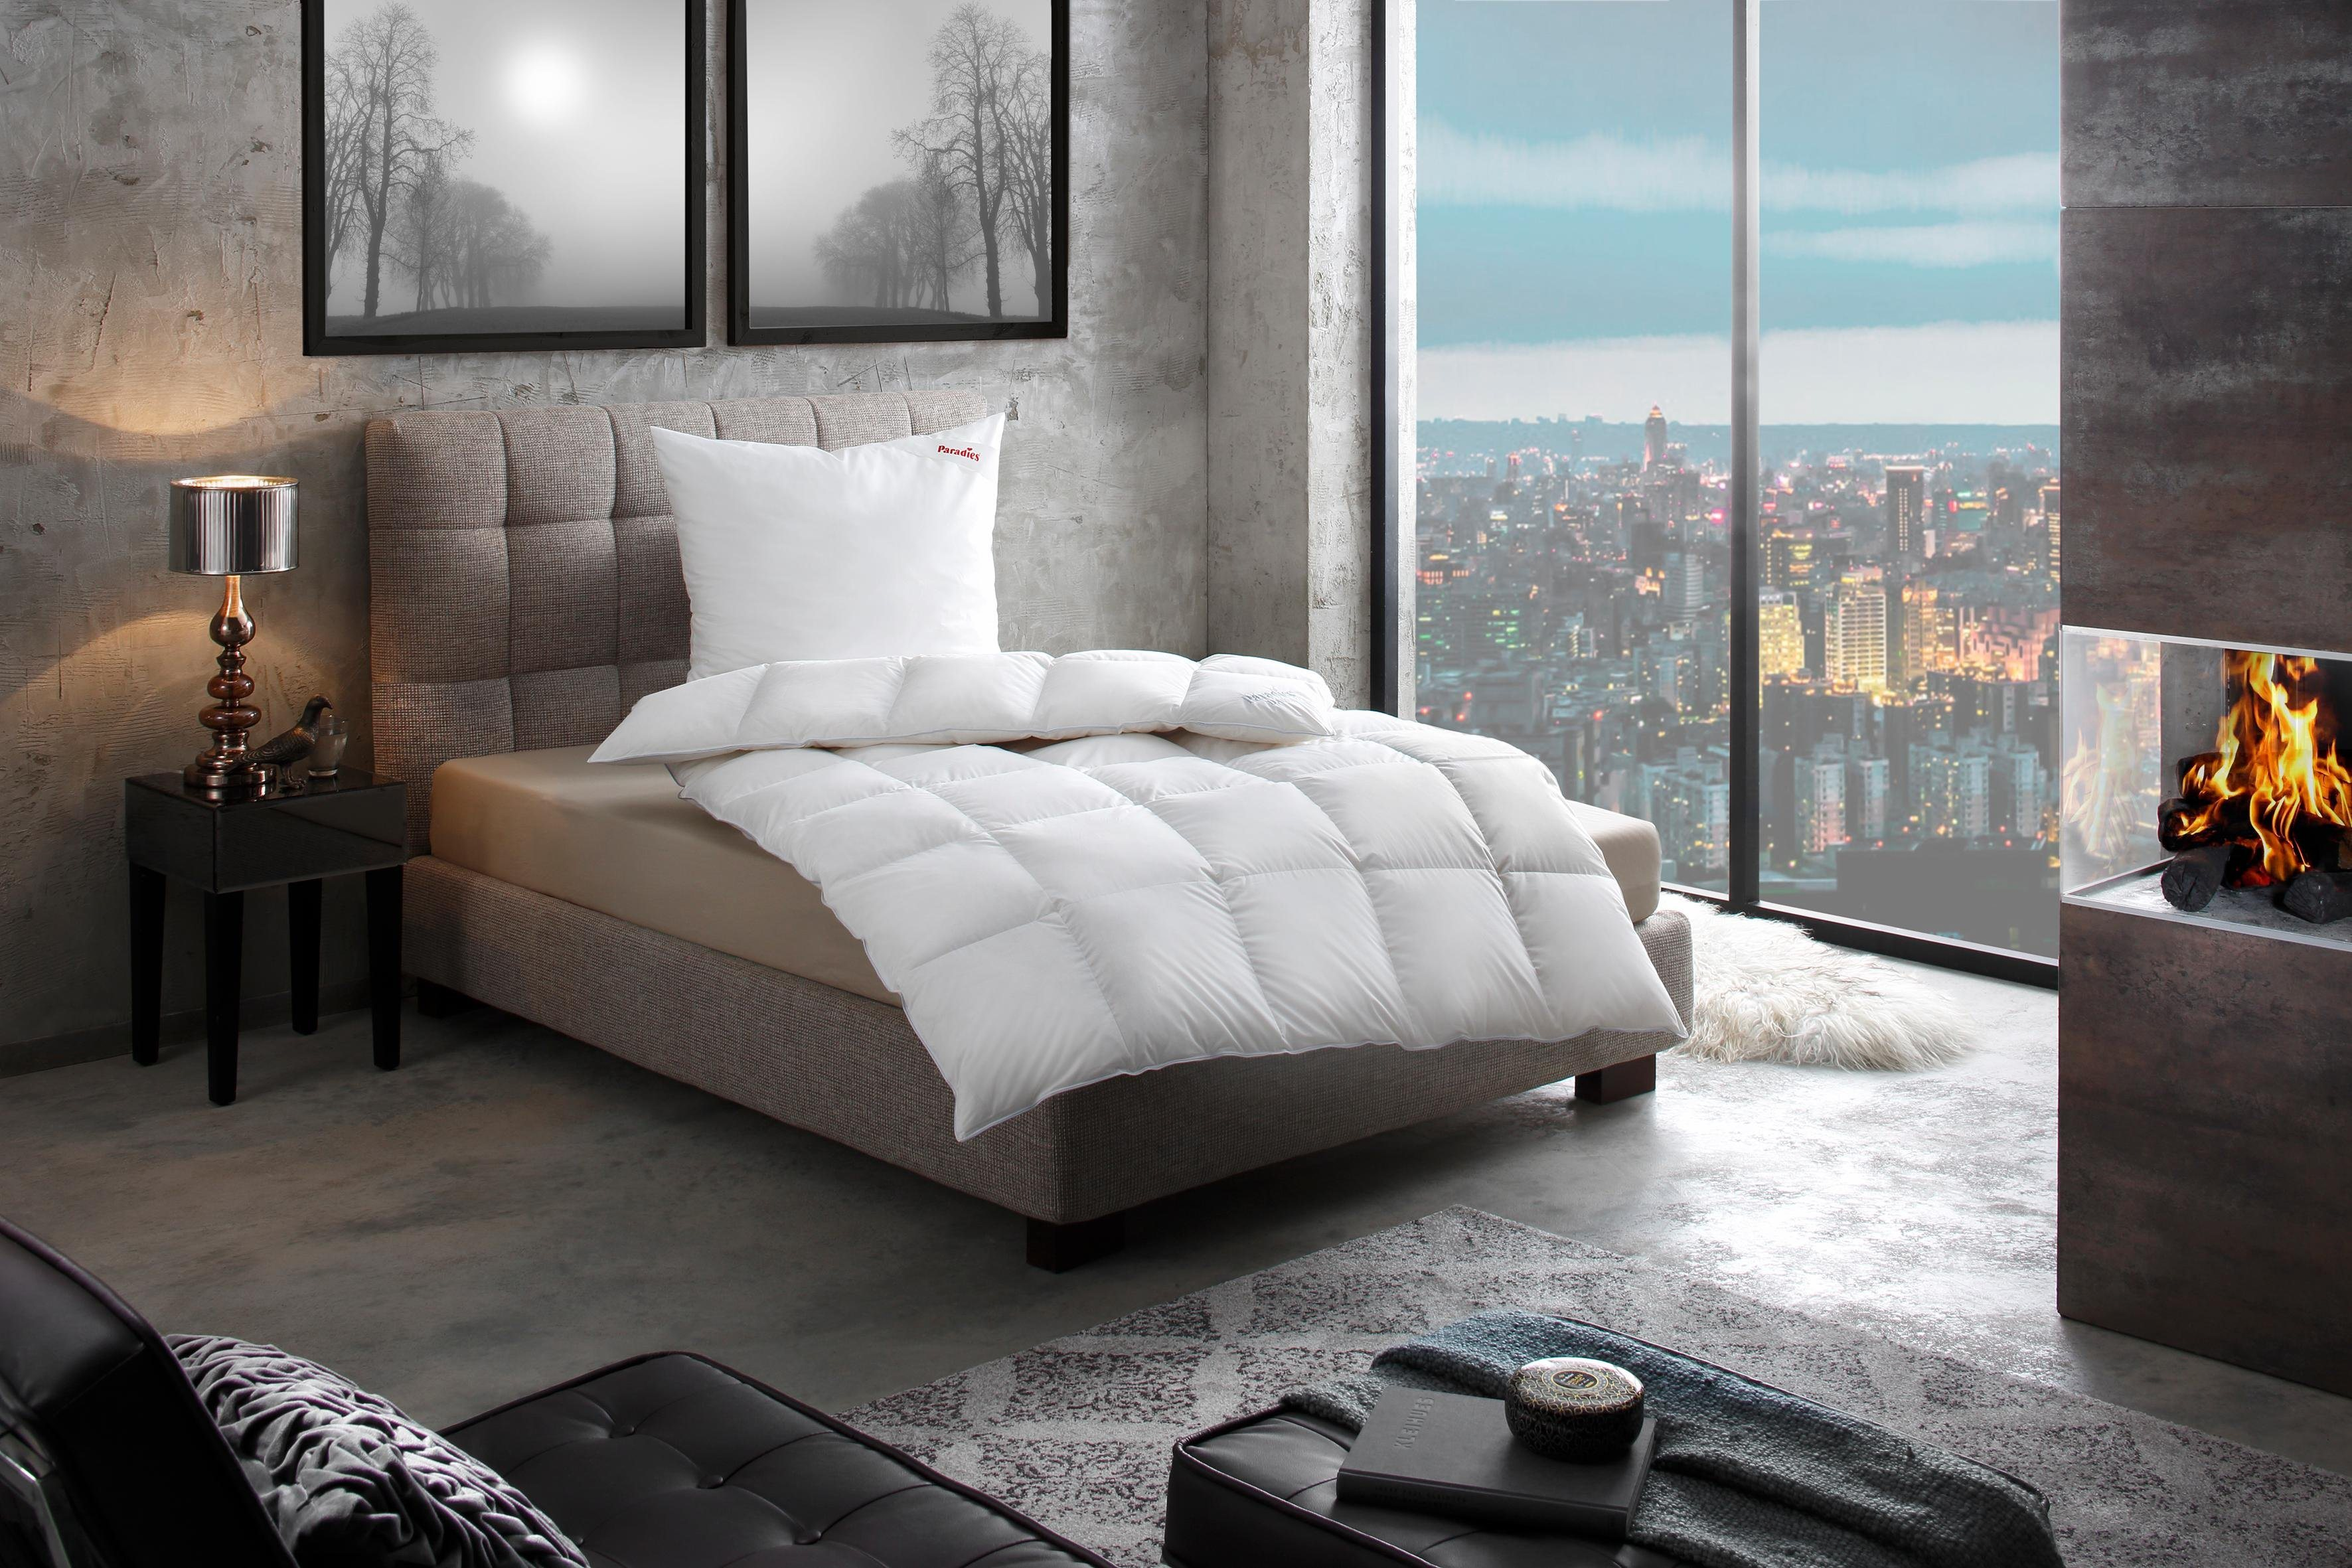 Daunenbettdecke, »Adela«, Paradies, extrawarm, Füllung: 100% Entendaunen, Bezug: 100% Baumwolle, (1-tlg) | Heimtextilien > Decken und Kissen > Bettdecken | Paradies